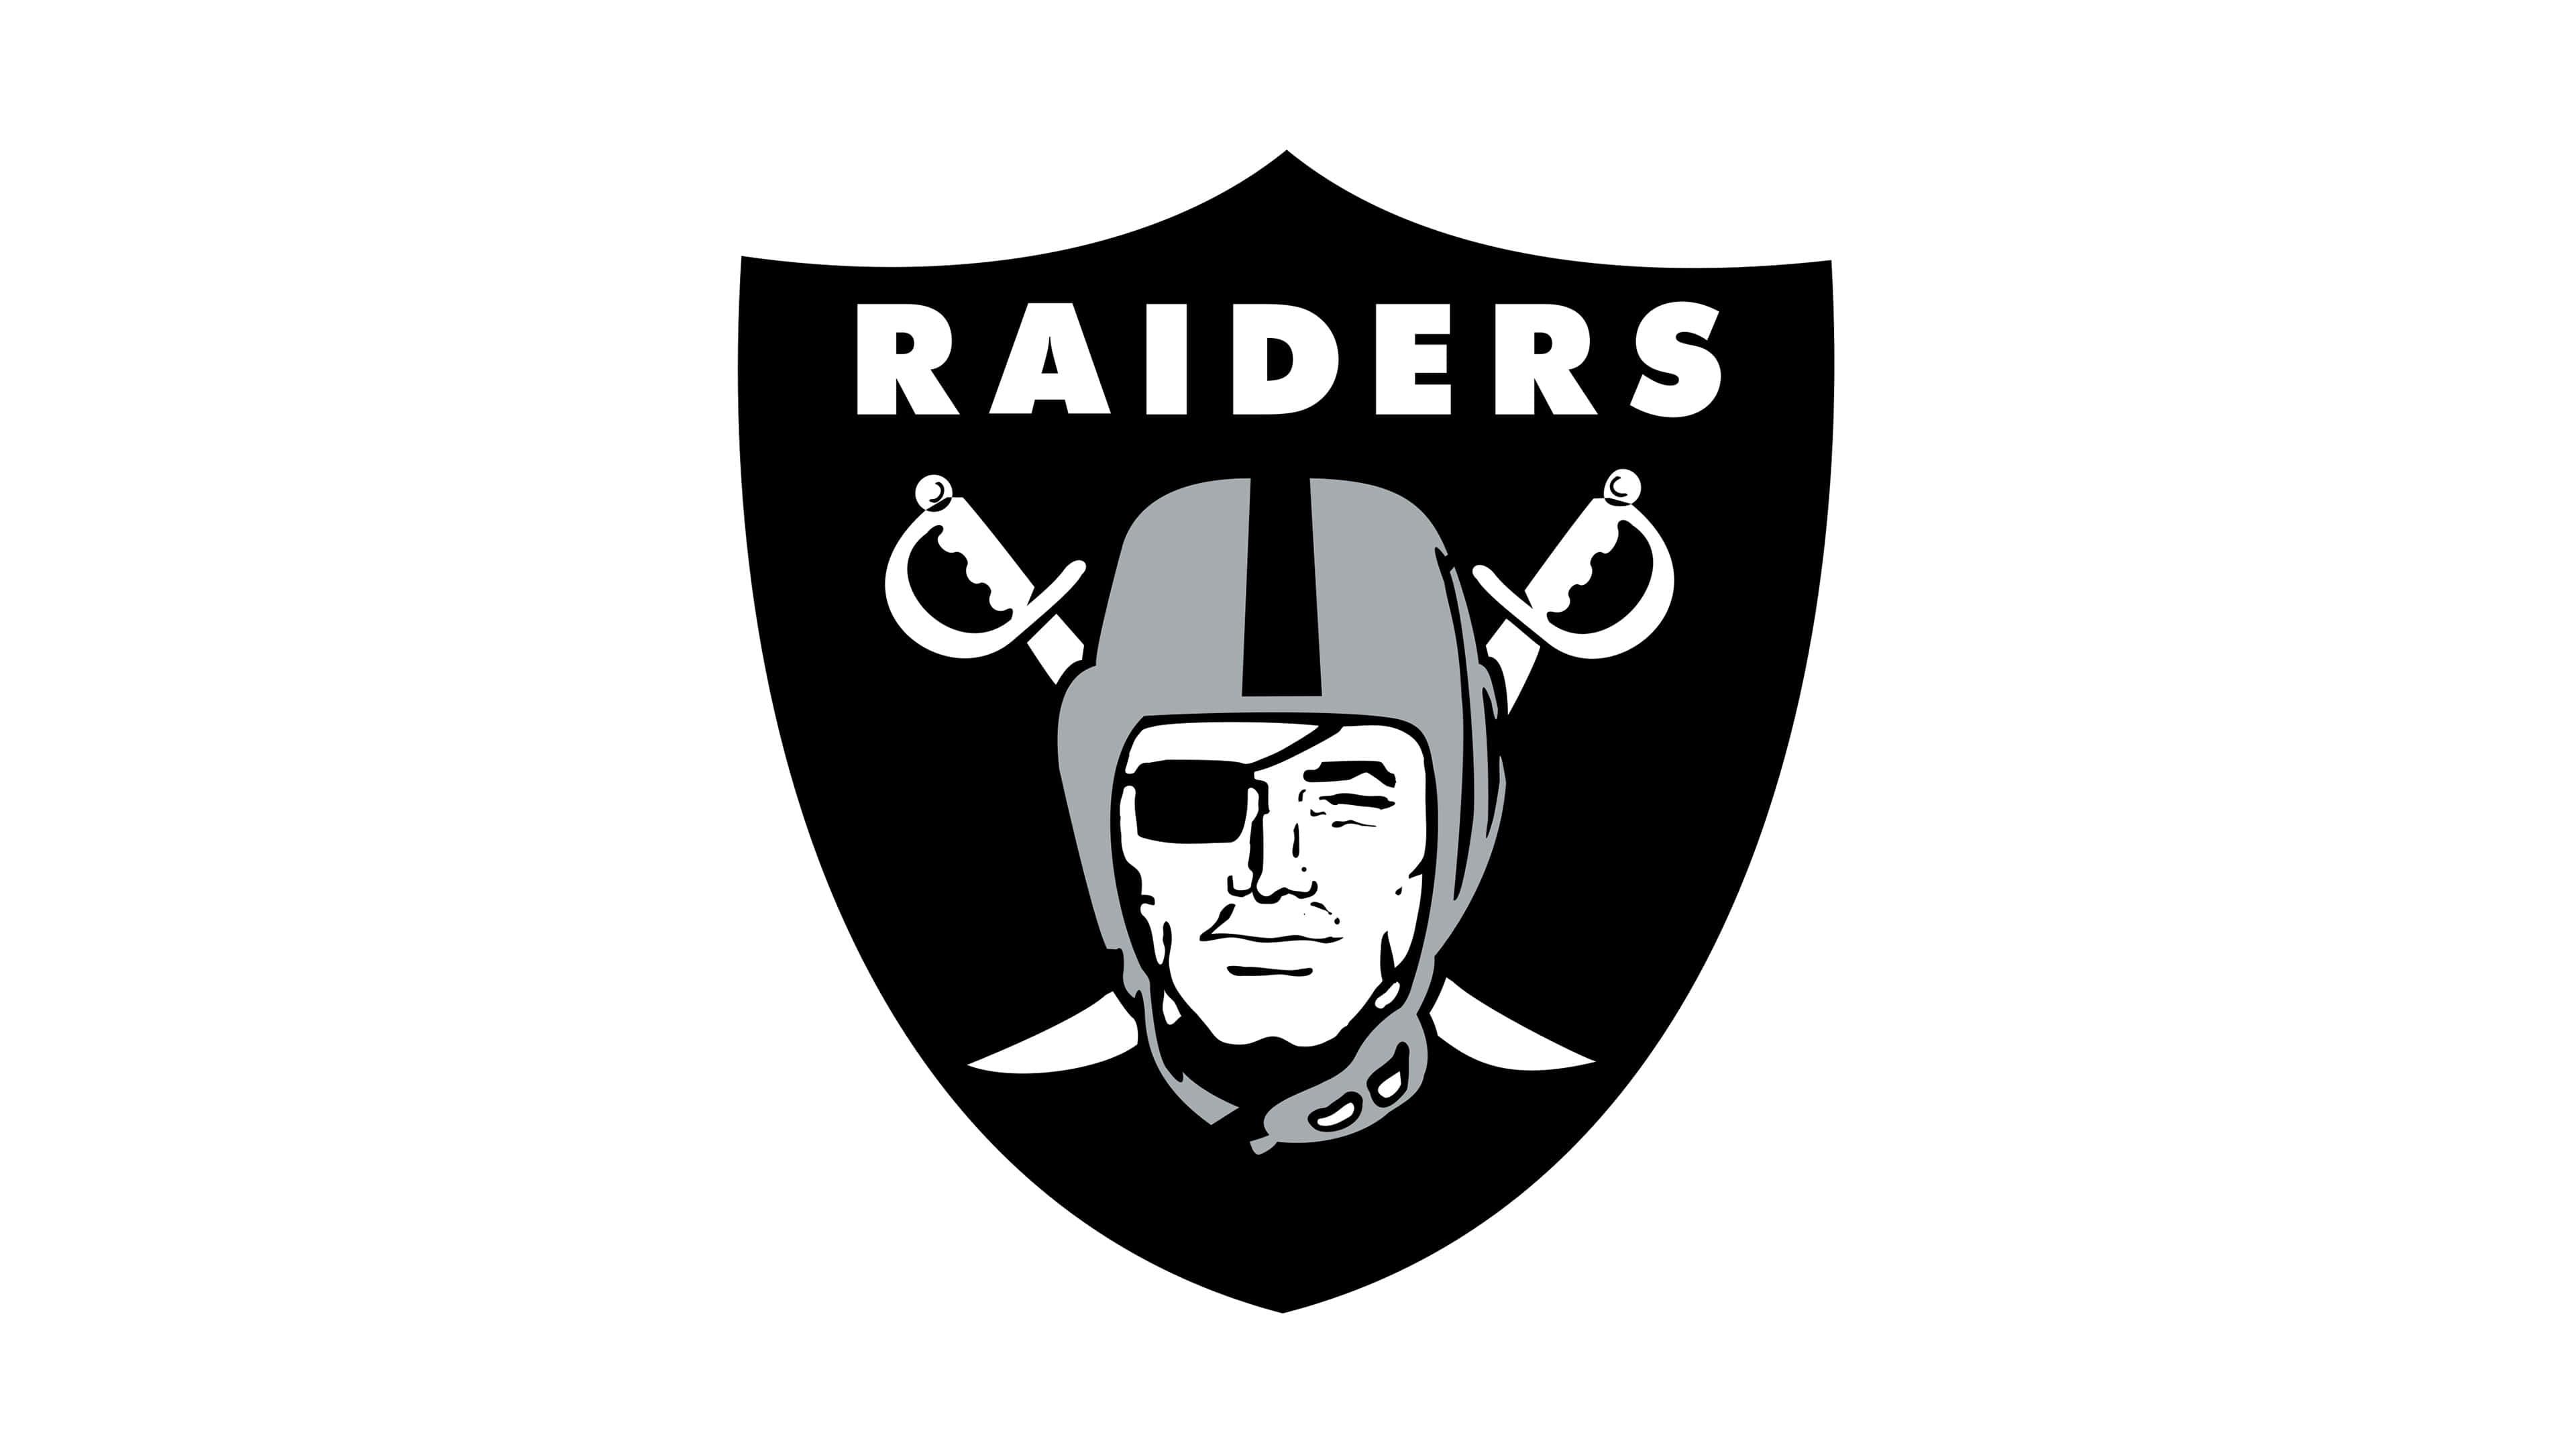 oakland raiders nfl logo uhd 4k wallpaper